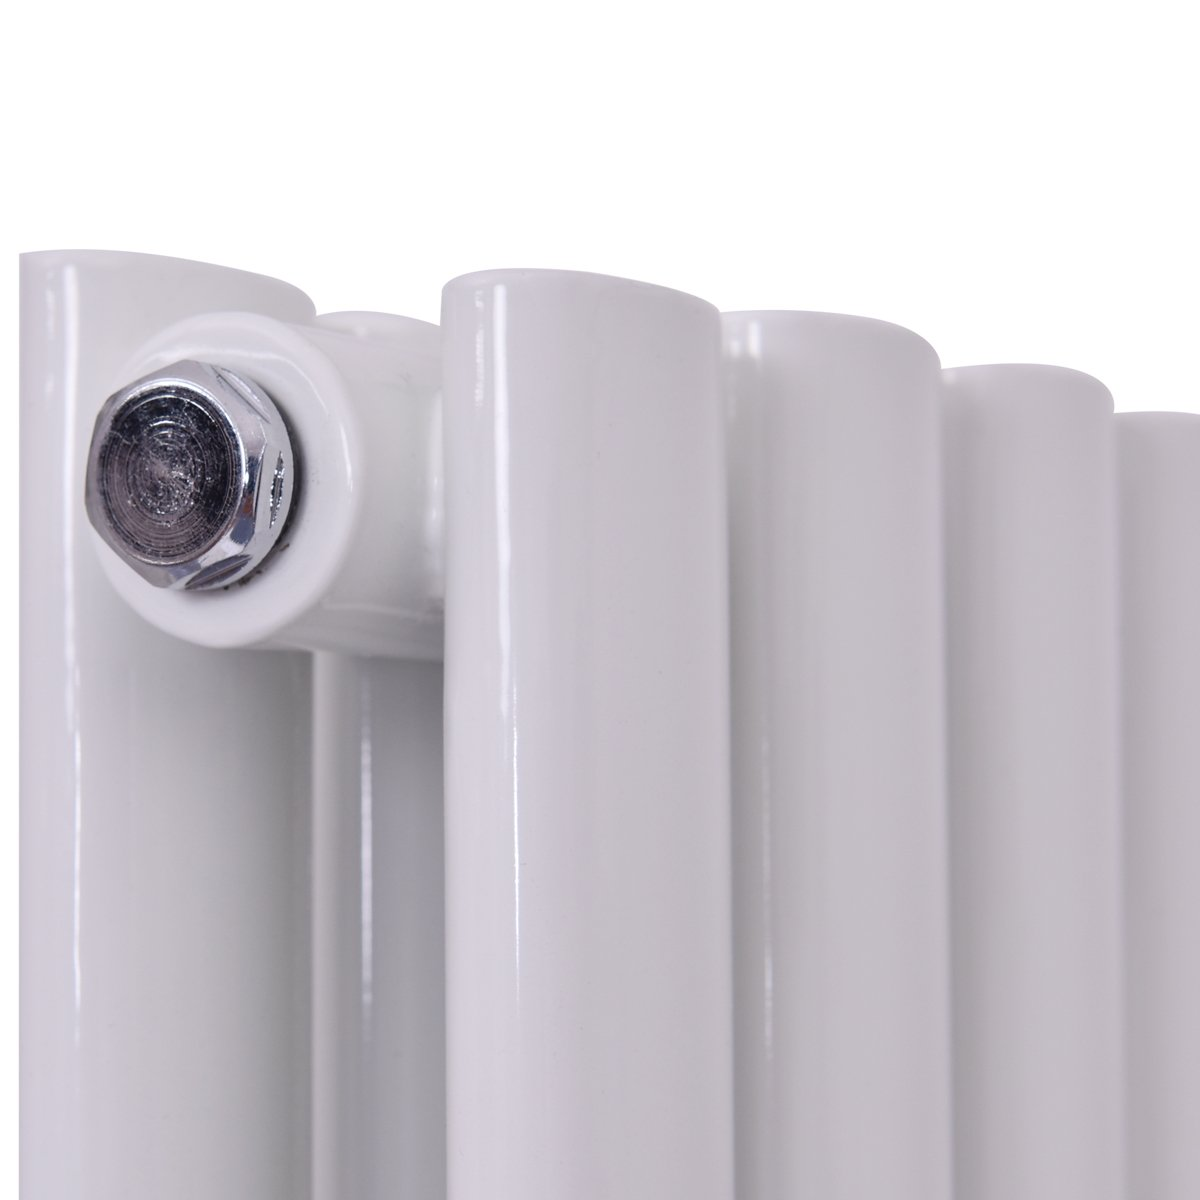 Bedroom Single//Double Flat Heating Panel White 1600x240mm-Single Bathroom Central Steel Heater COSTWAY Vertical Column Designer Radiator for Living Room